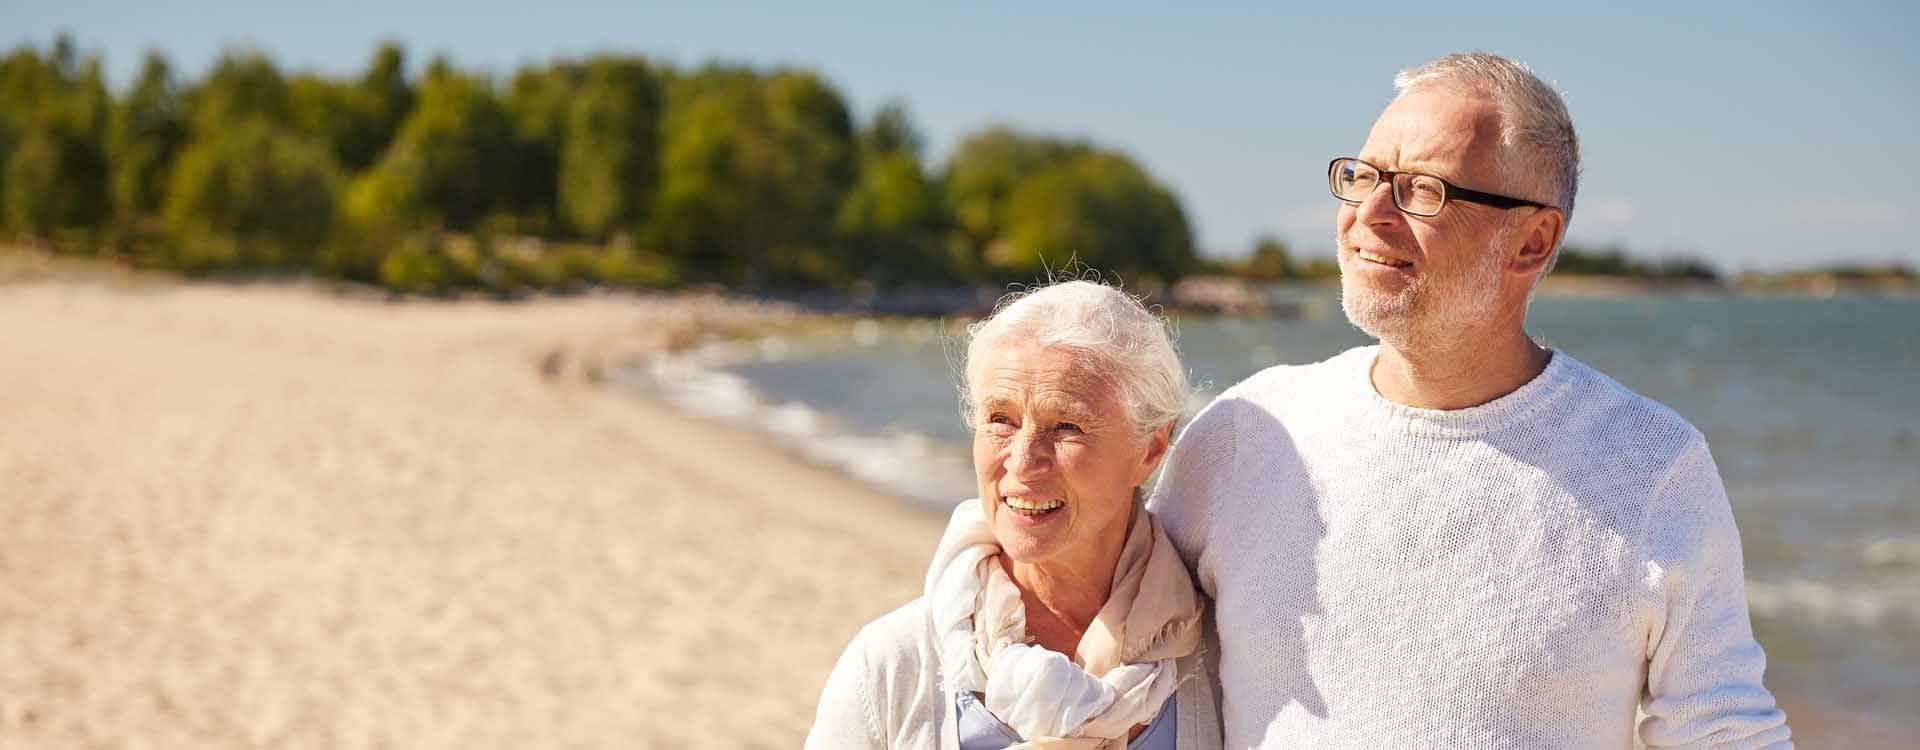 international life insurance